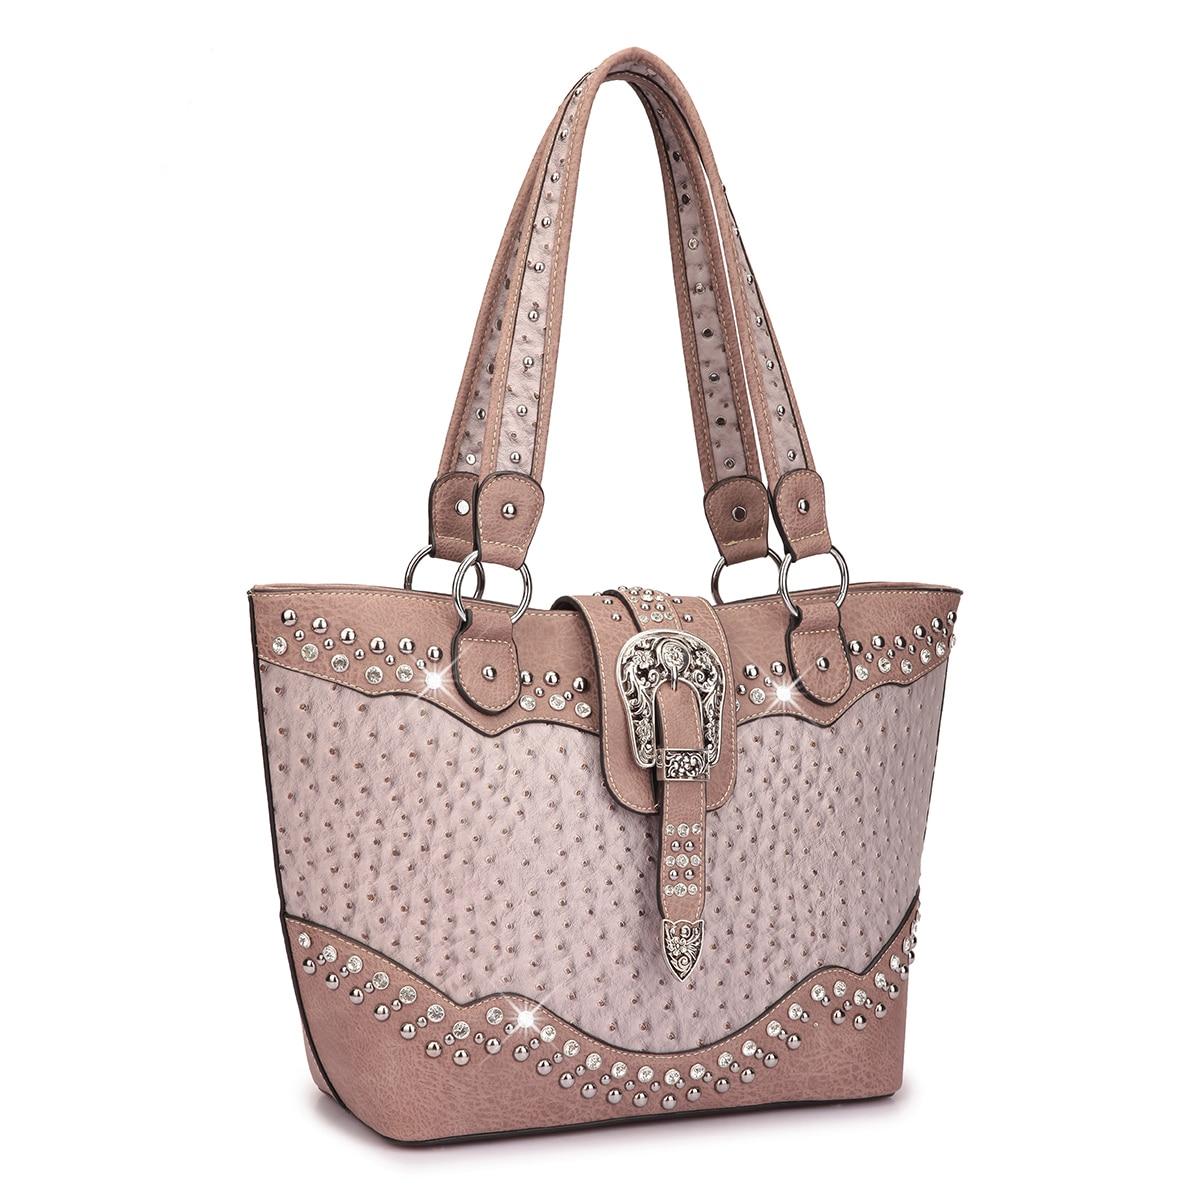 0c747988b4 Dasein Western Style Embossed Ostrich Rhinestone Buckle Tote Handbag ...